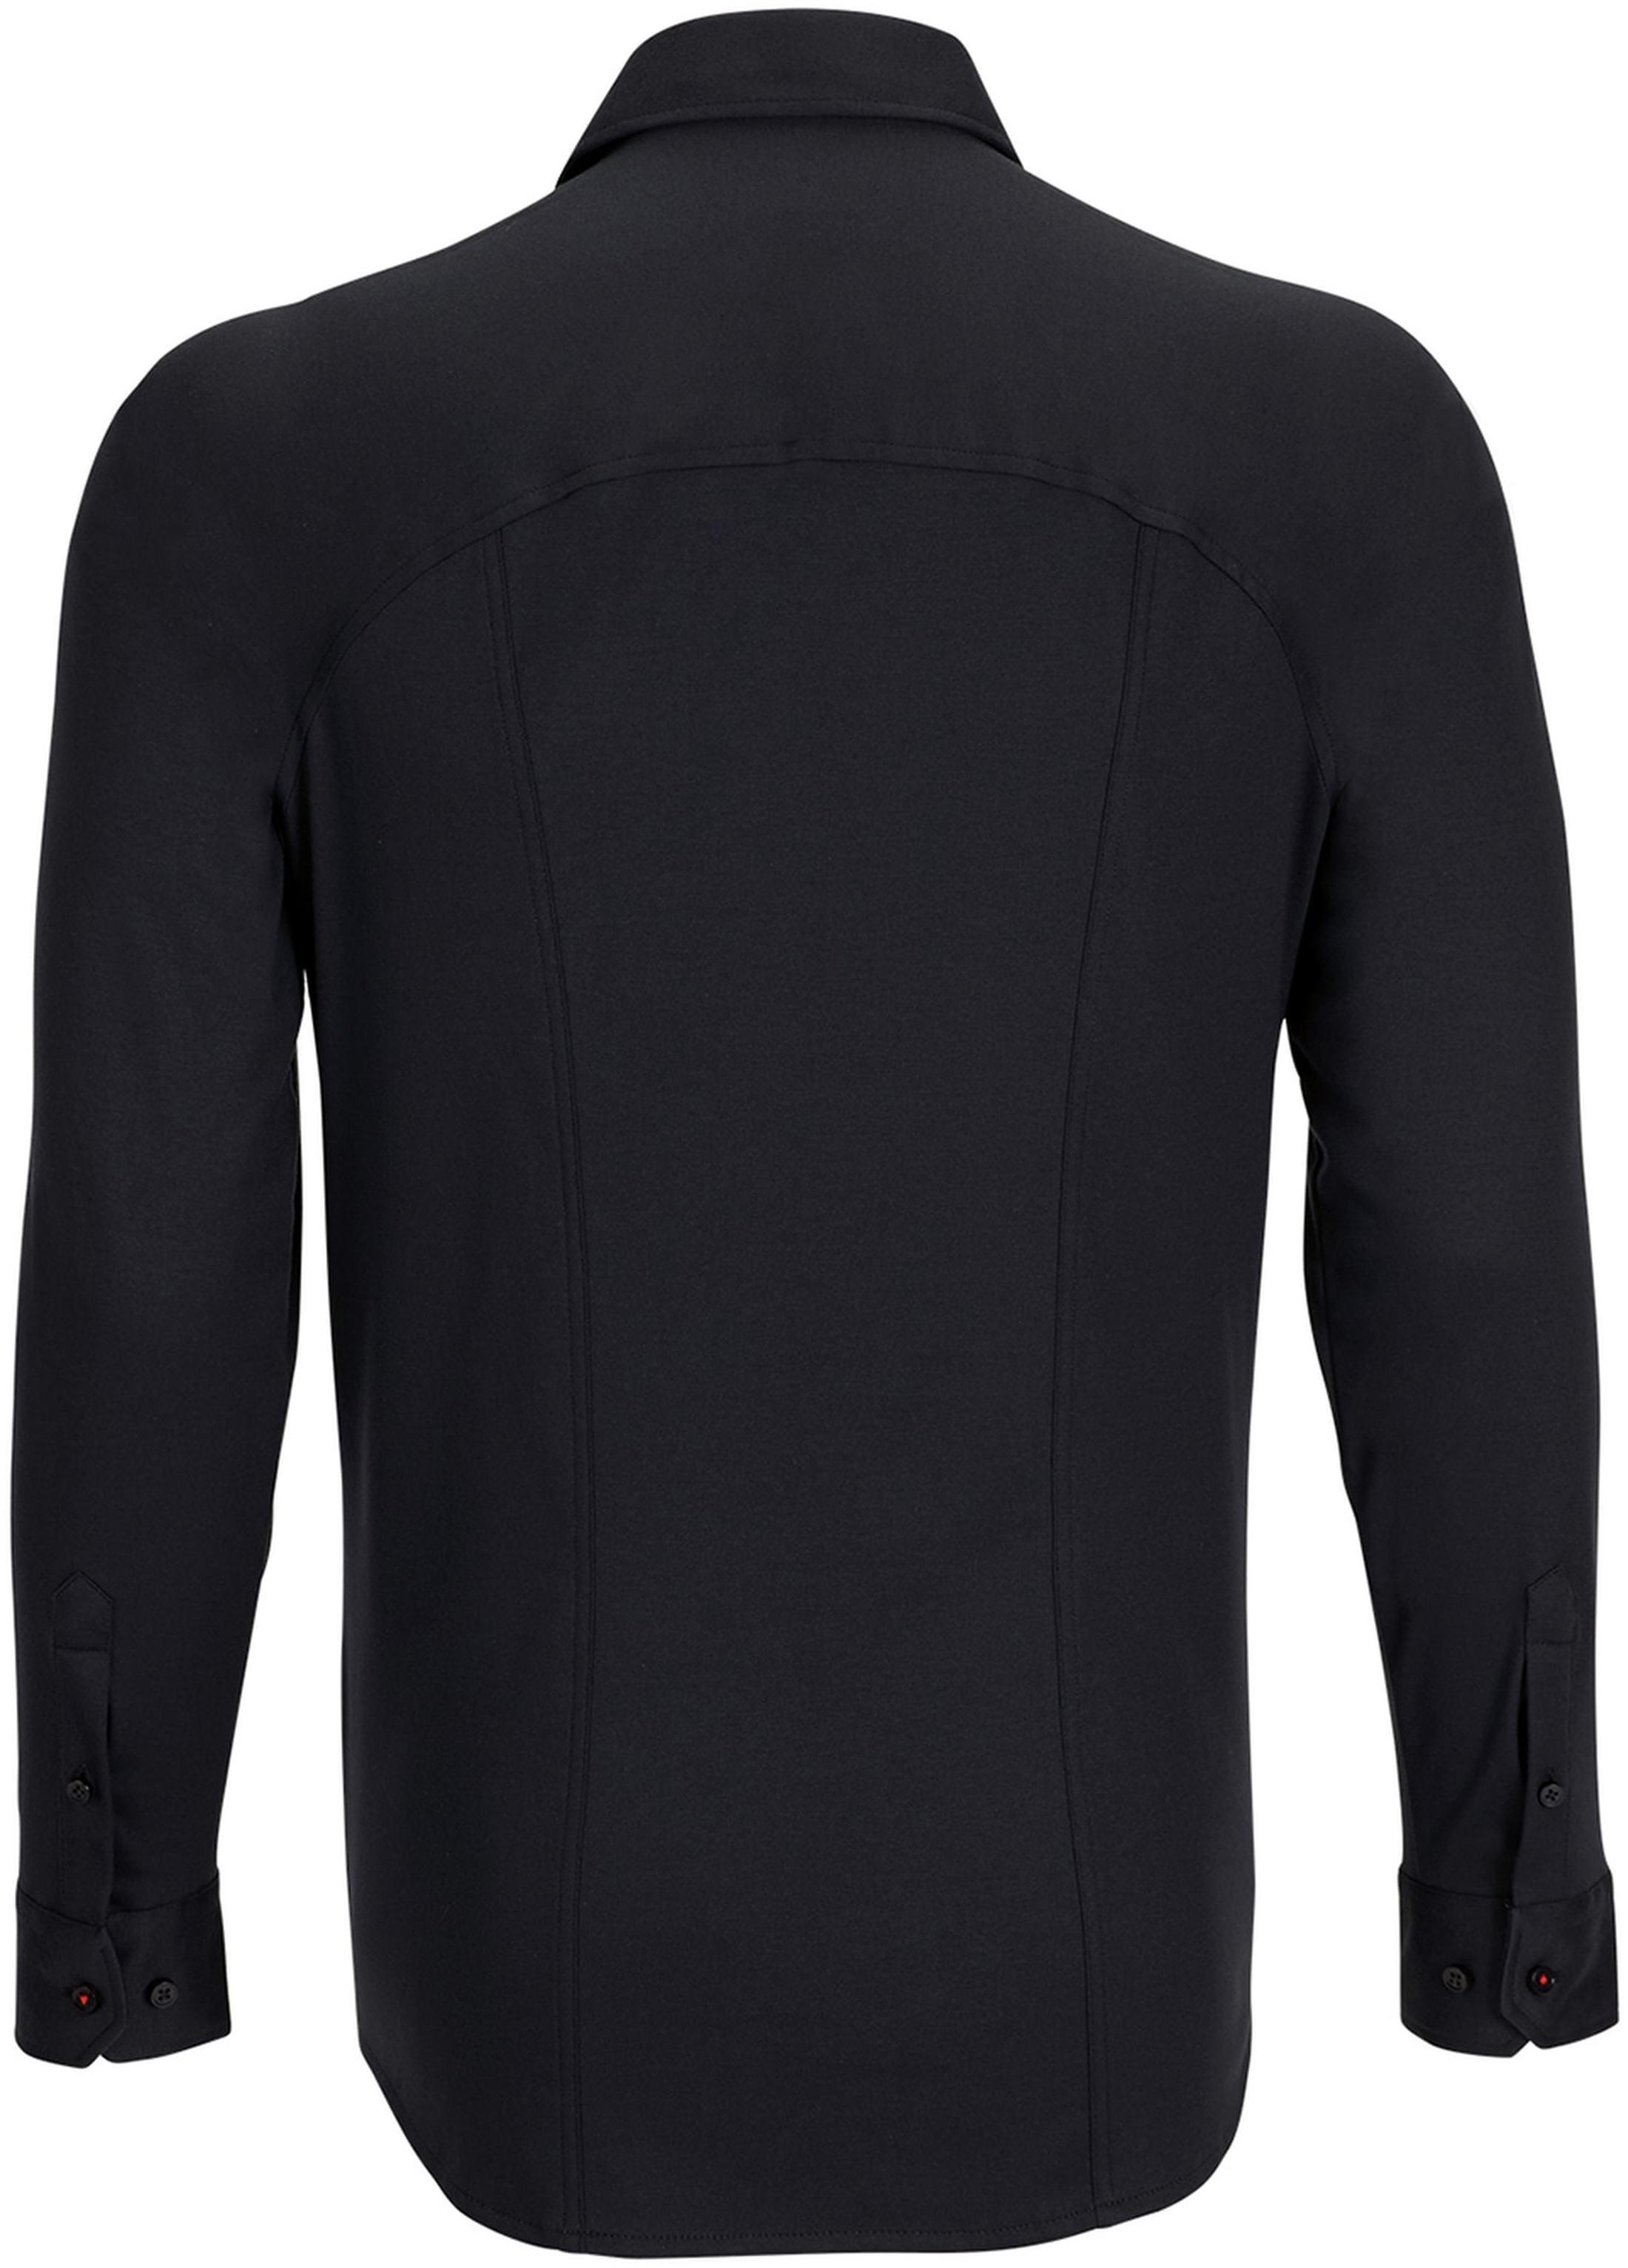 Desoto Overhemd Strijkvrij Zwart foto 1